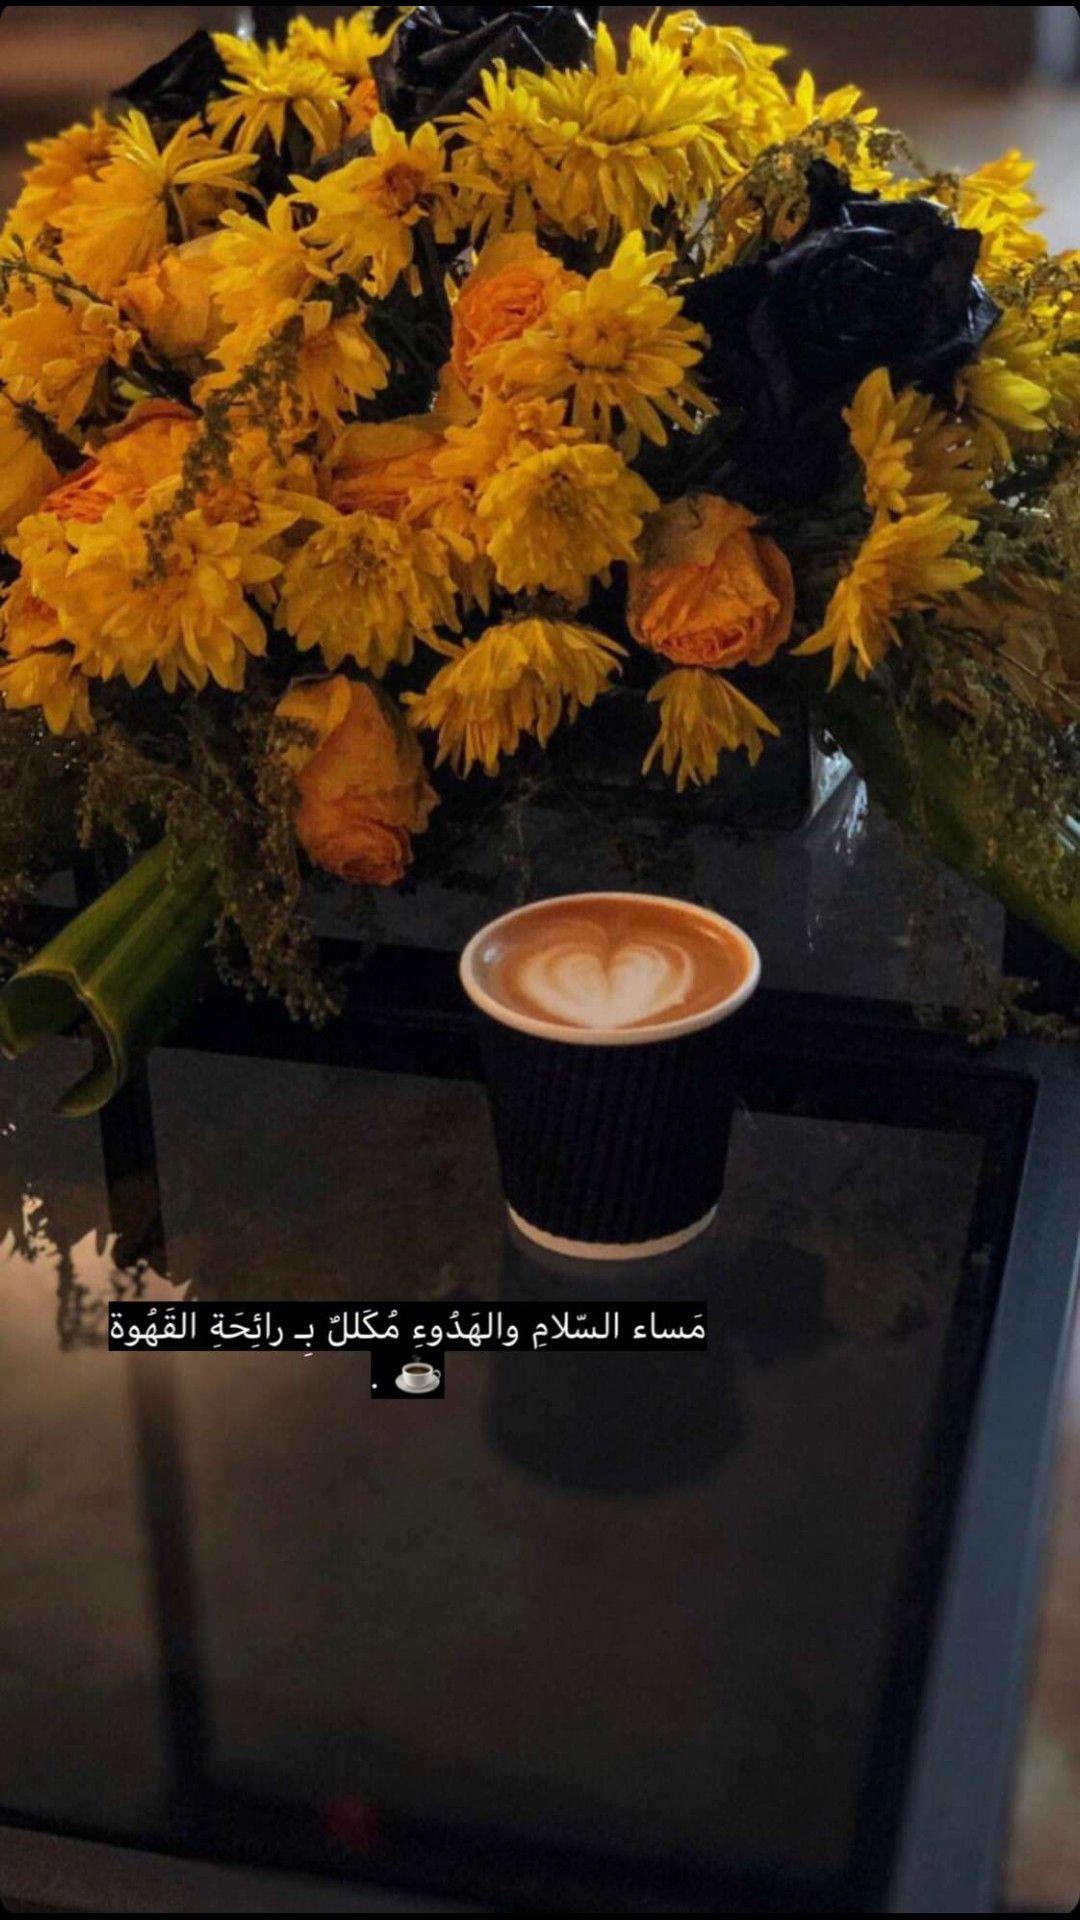 4 29 Photo Quotes Arabic Quotes Photo